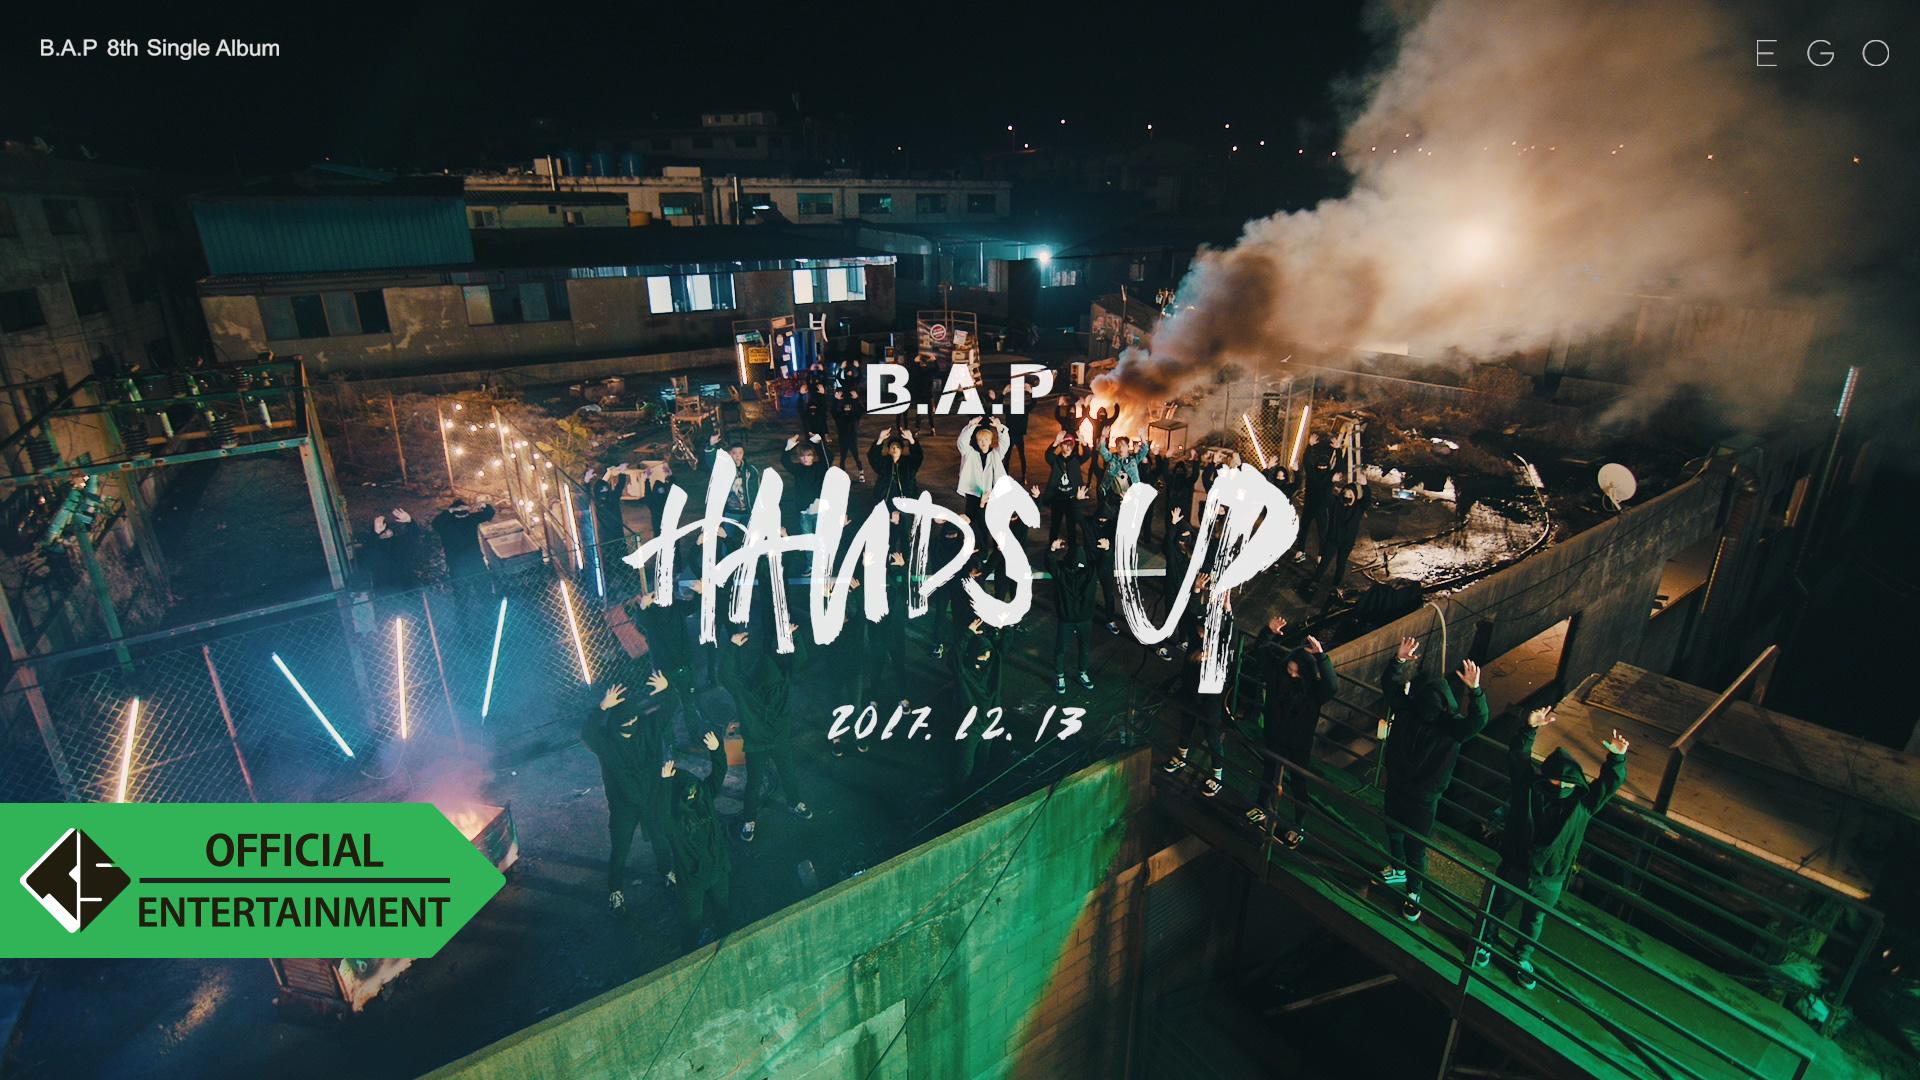 B.A.P - HANDS UP M/V Trailer